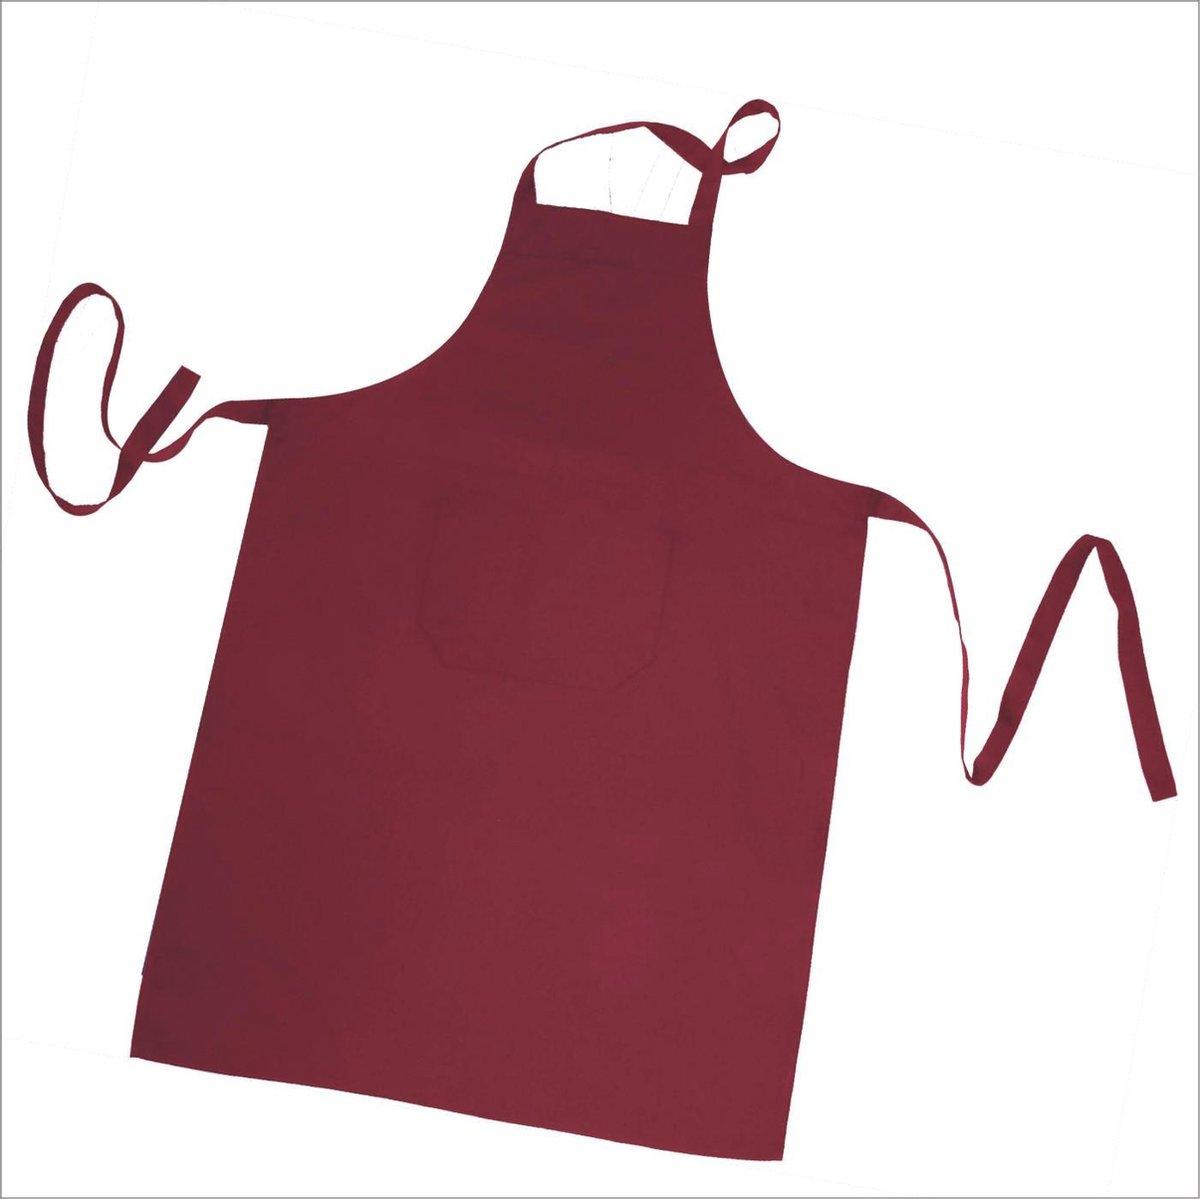 Homéé® Horeca suite Keukenschorten BBQ BIB Apron - Bordeaux Rood - 70x100 cm - 2 stuks